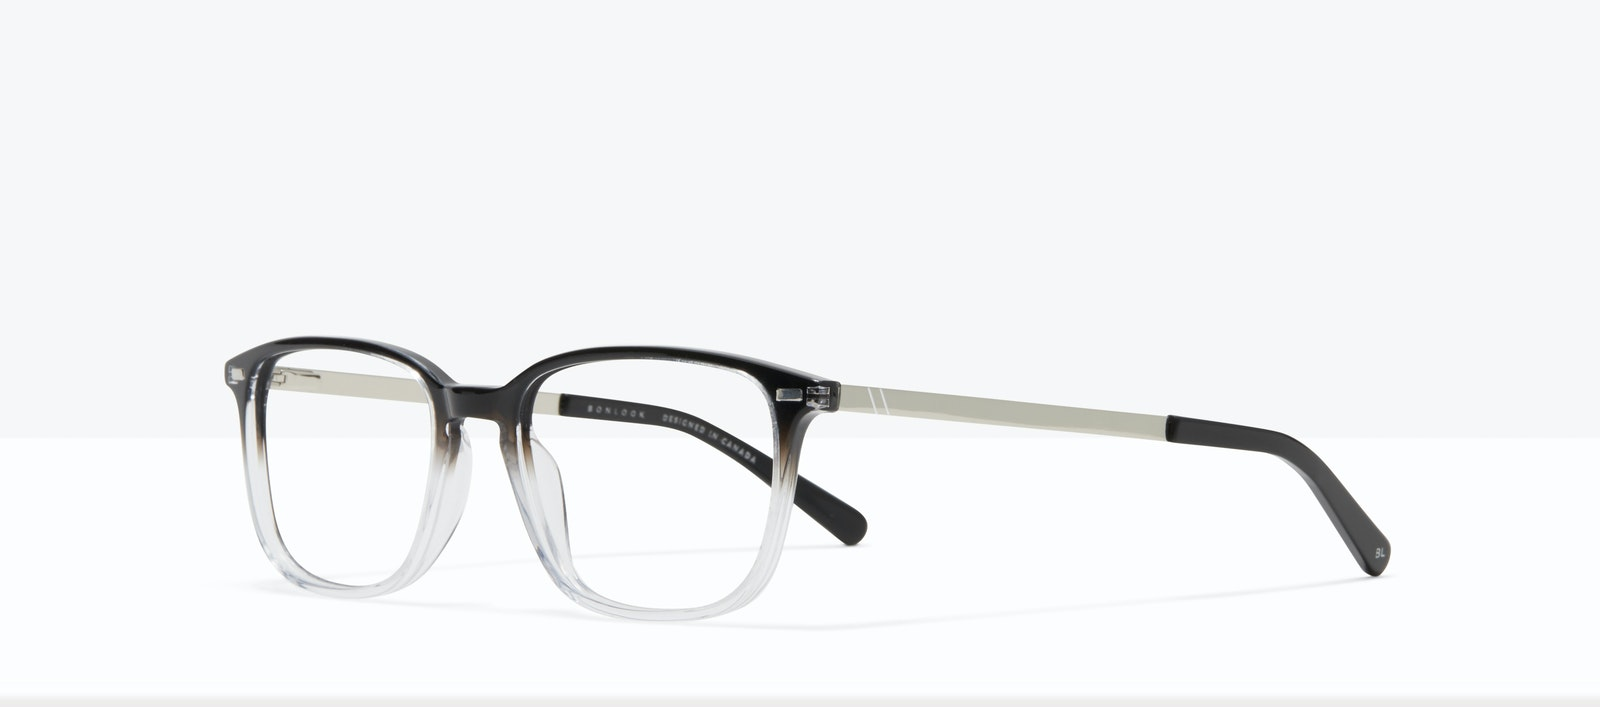 Affordable Fashion Glasses Rectangle Eyeglasses Men Sharp L Onyx Clear Tilt